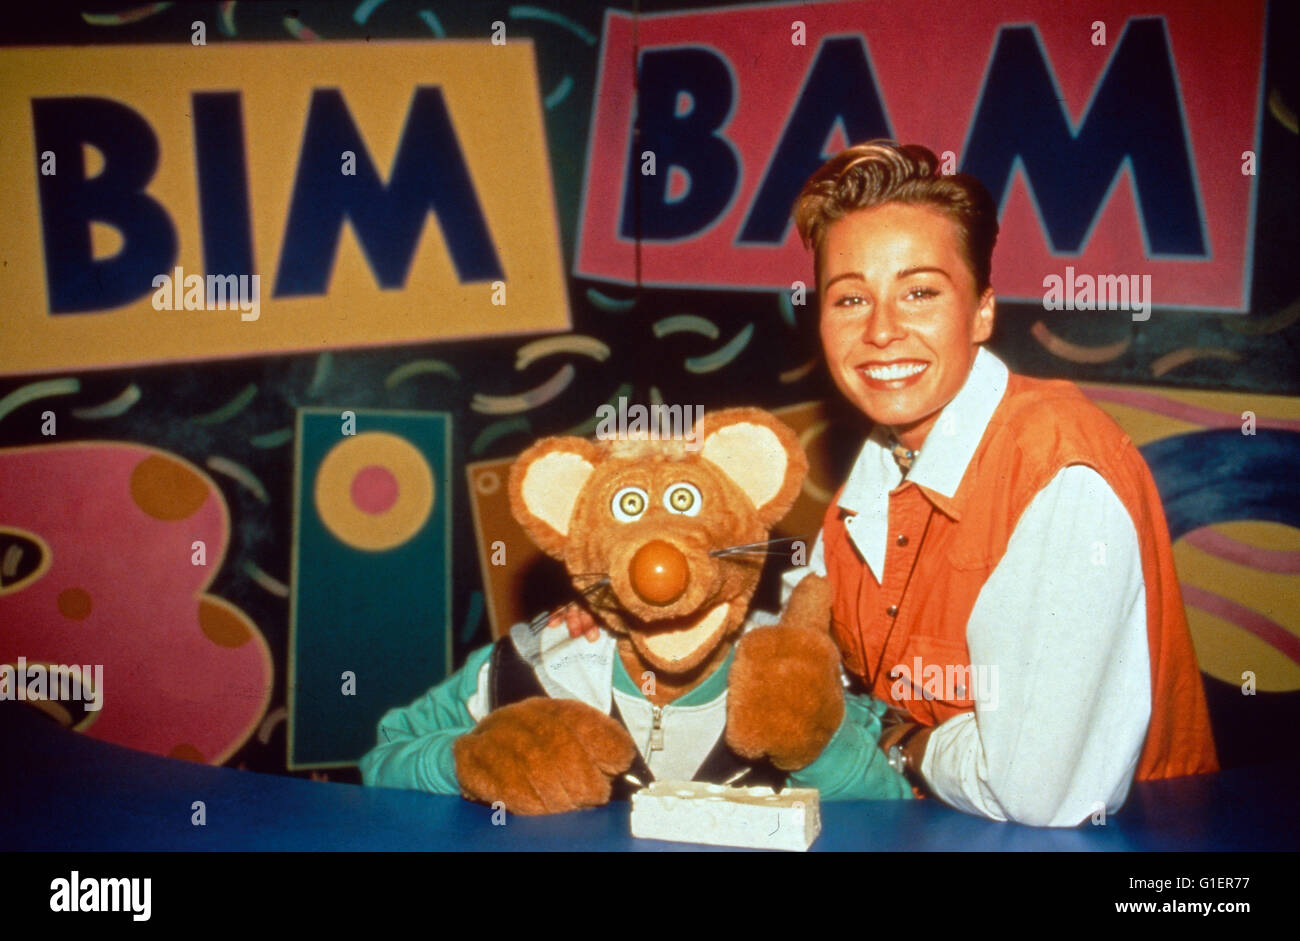 Bim Bam Microscópios binoculares, Kinderfernsehserie, Deutschland 1988 - 1998, Maus Microscópios binoculares Imagens de Stock